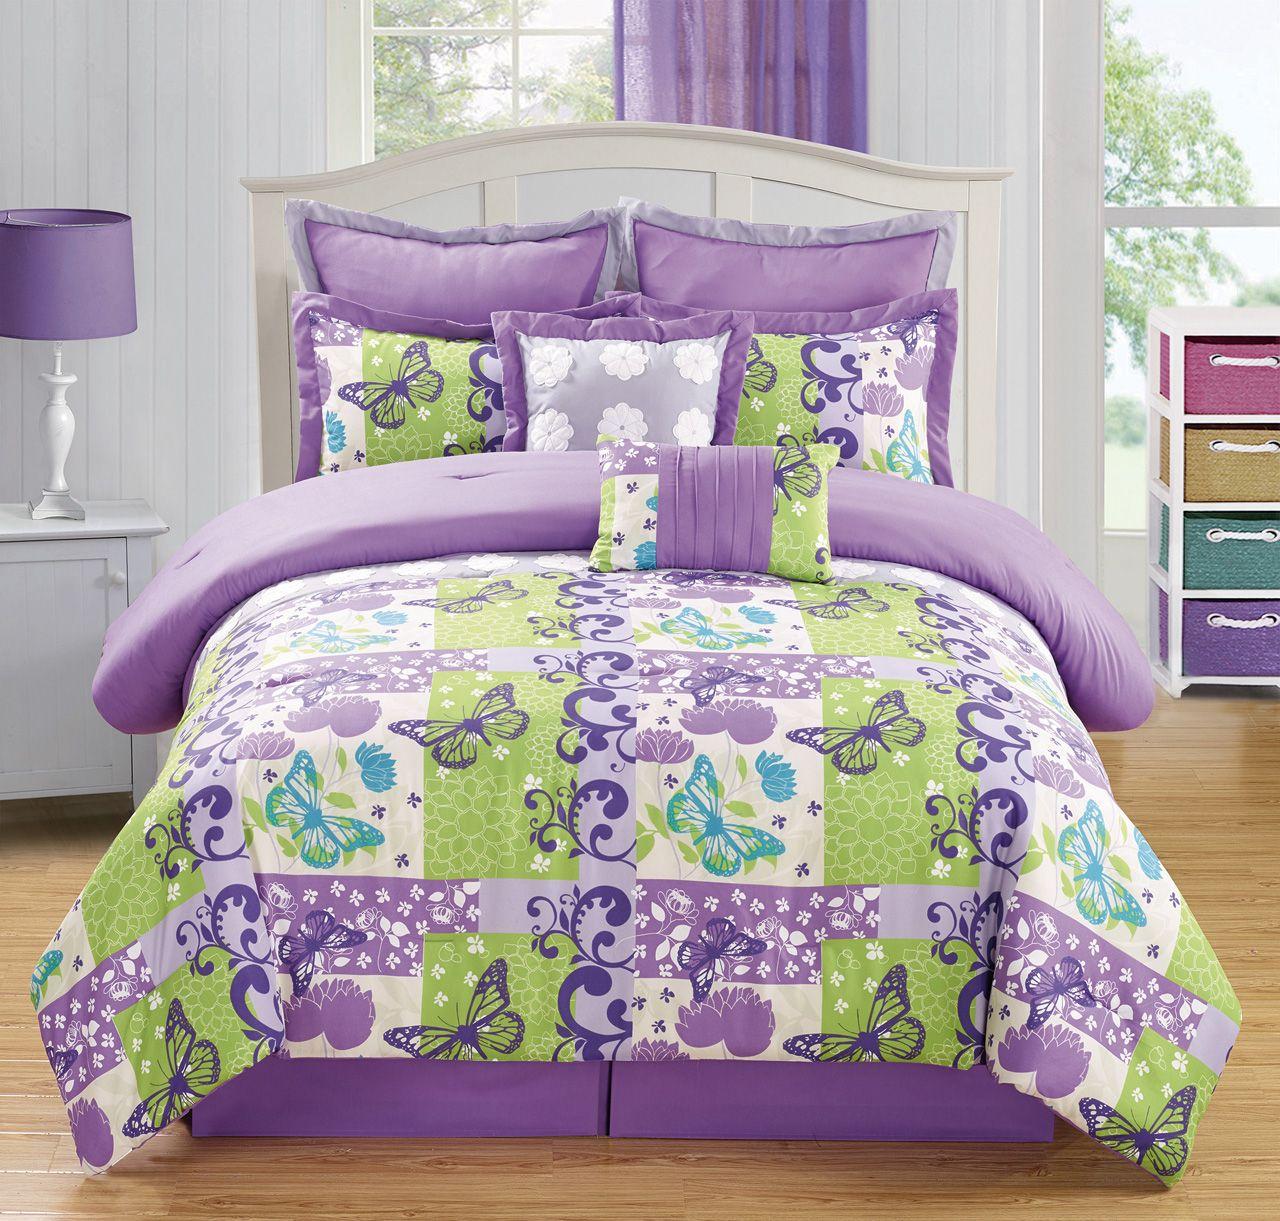 Best 12 Piece Butterfly Purple Green Bed In A Bag Set Green 400 x 300